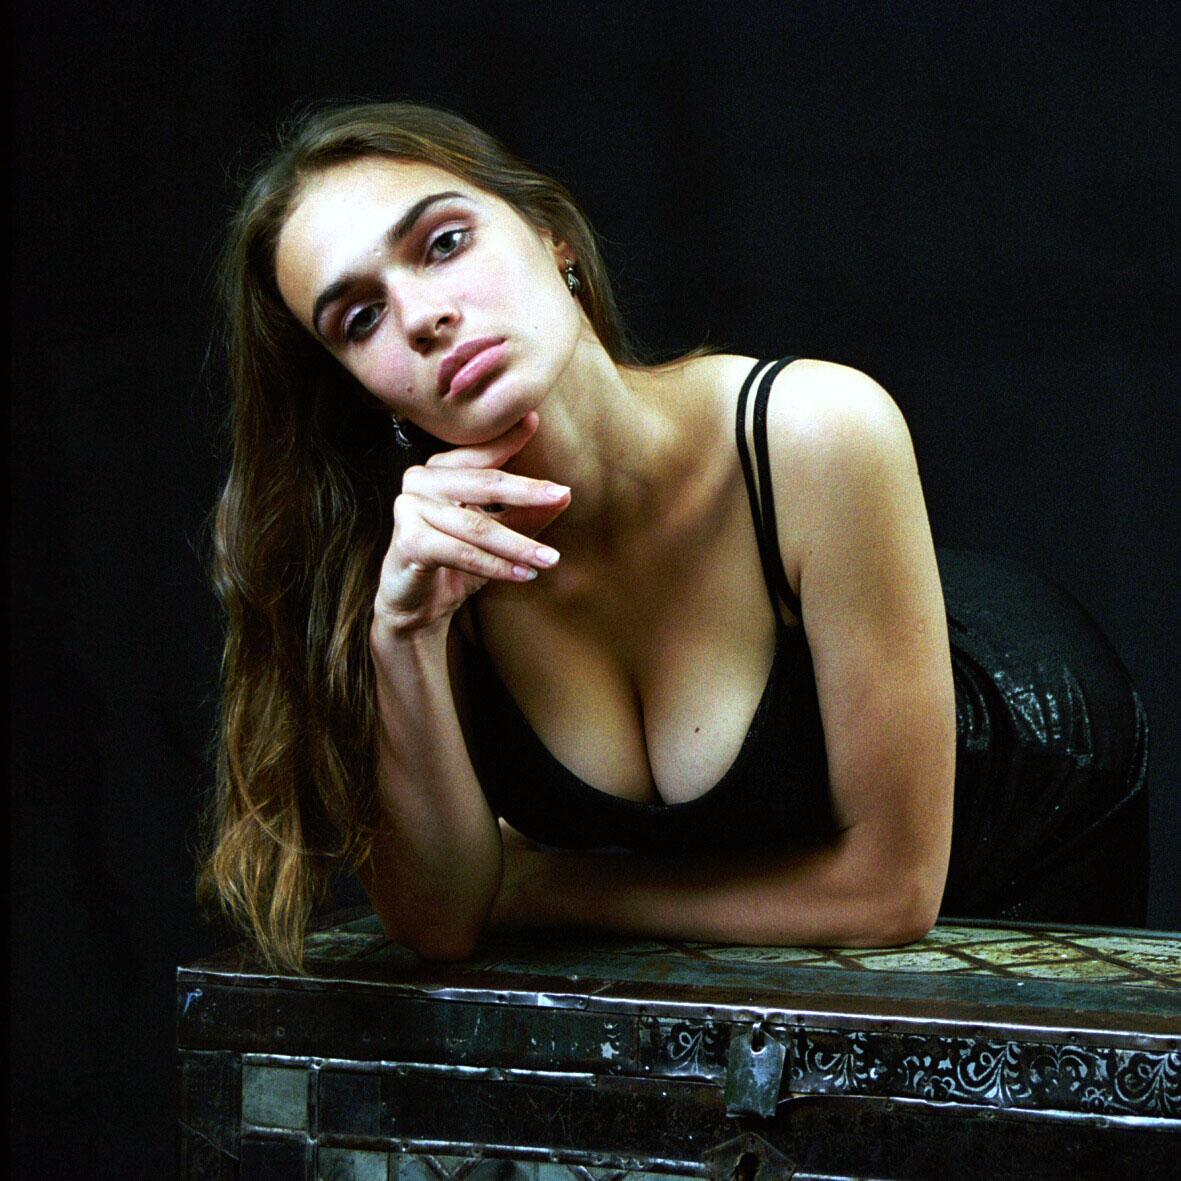 vodonaeva-soset-u-stepana-foto